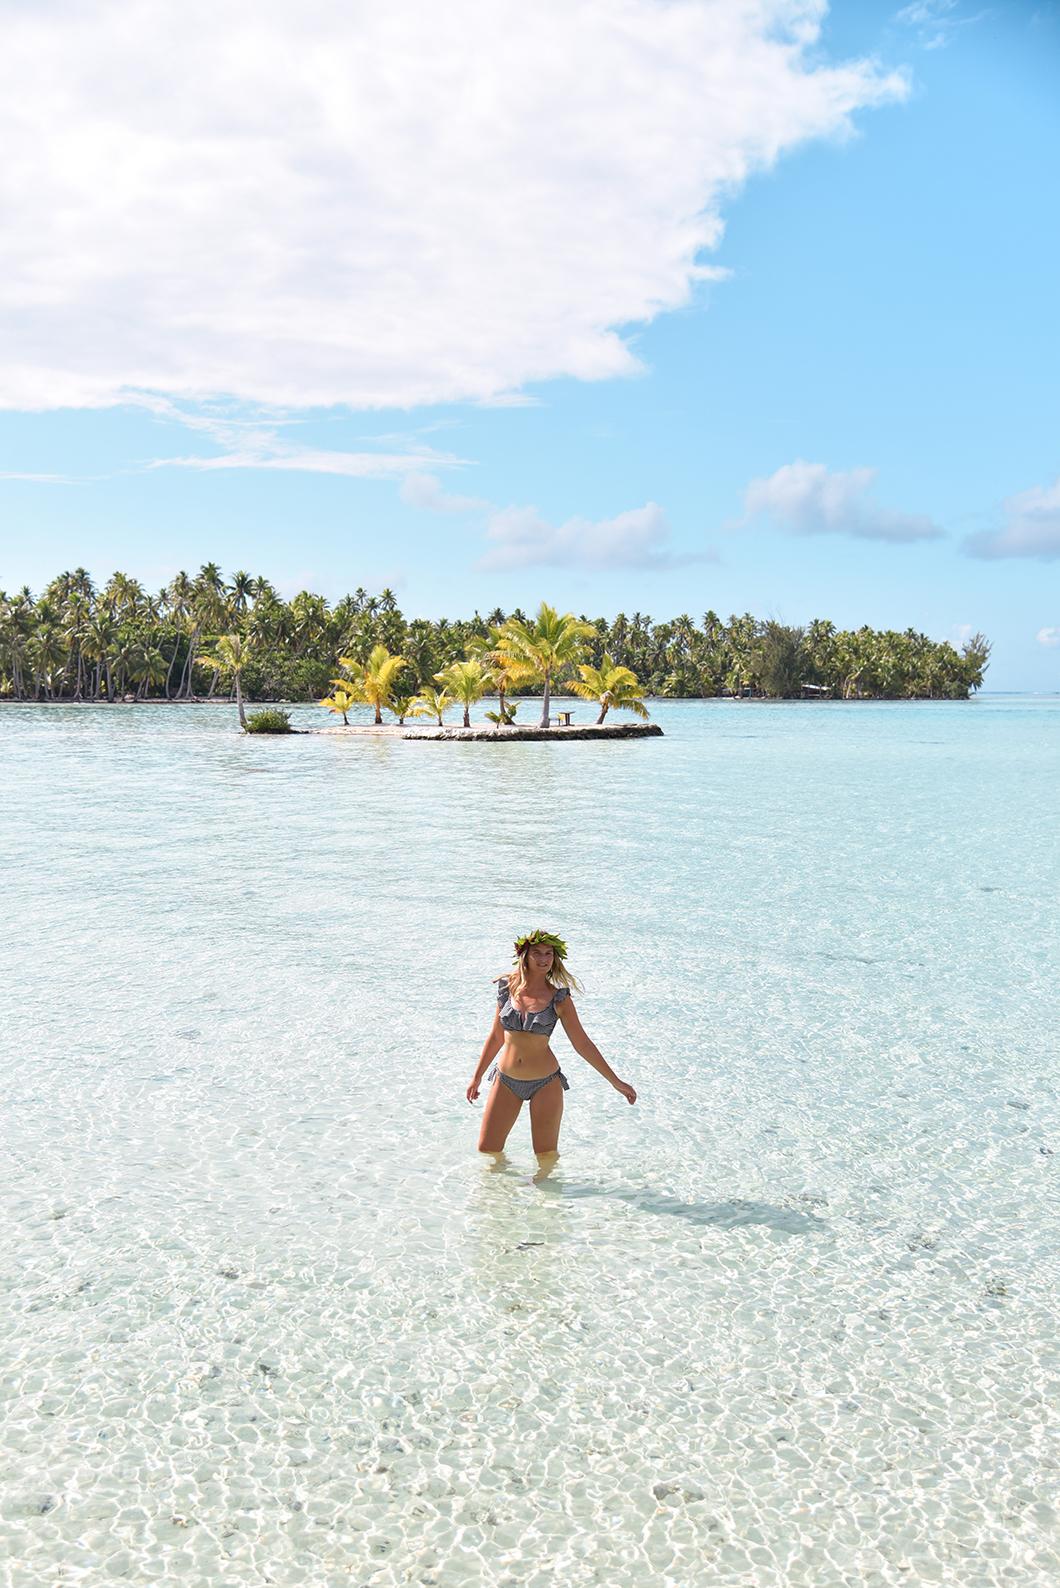 L'île en forme de coeur au Taha'a Island Resort and Spa